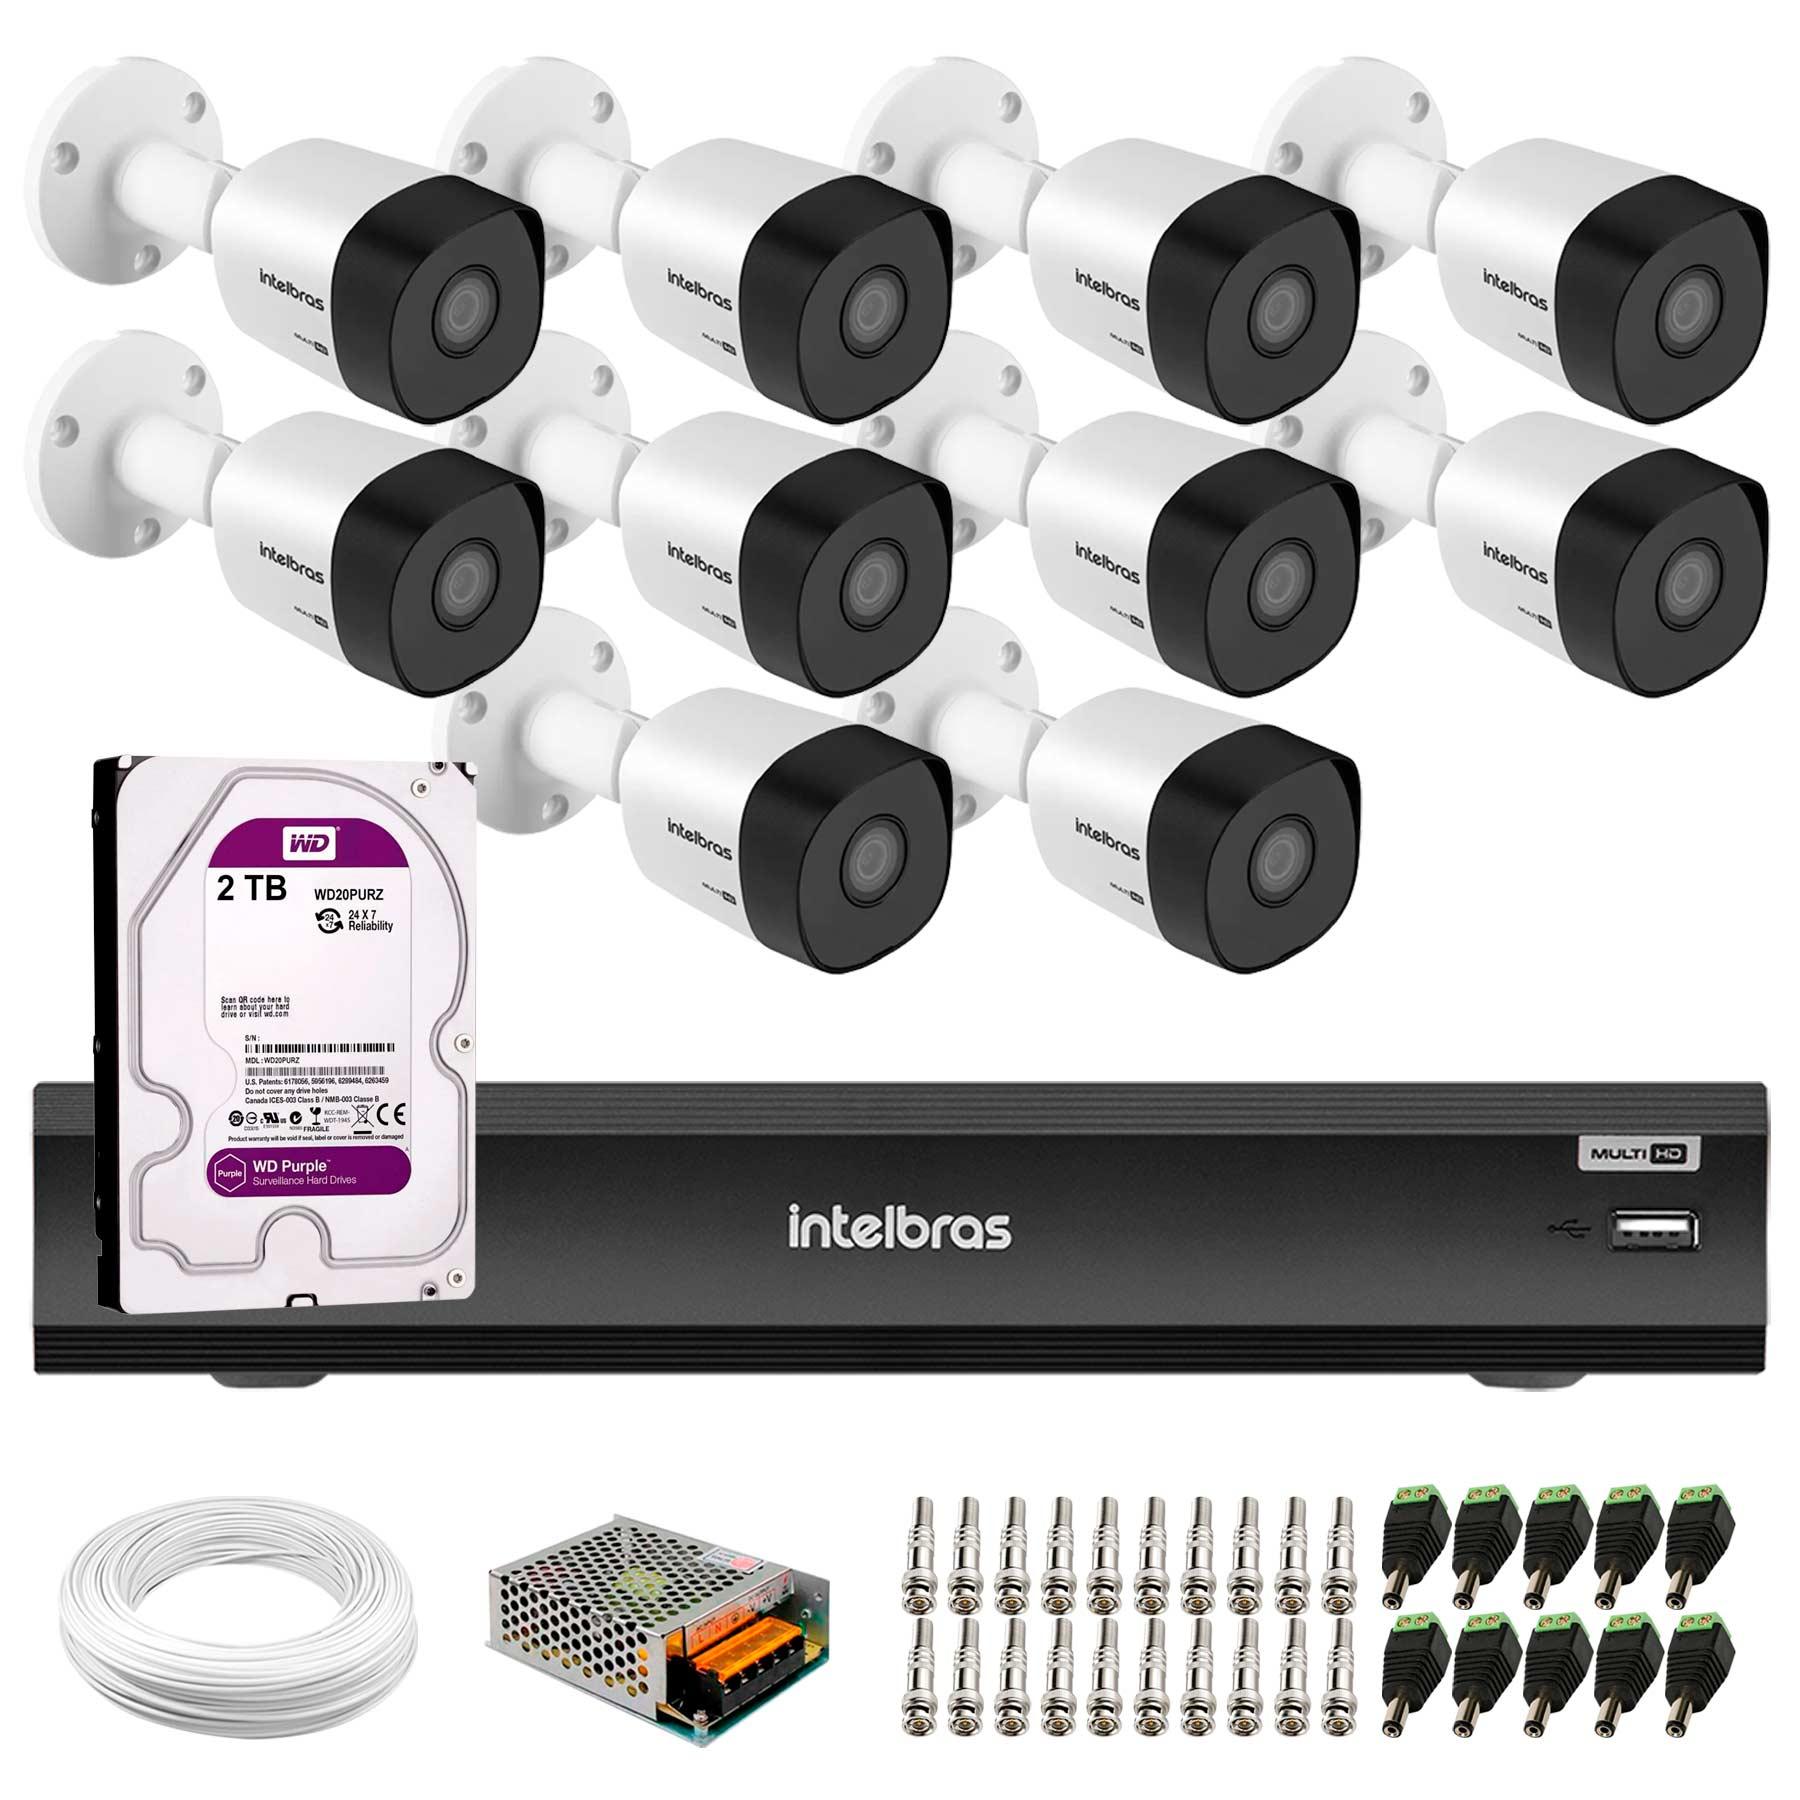 kit-12-cameras-de-seguranca-full-hd-1080p-vhd-3230-b-g5-dvr-intelbras-mhdx-3116-full-hd-de-16-canais-acessorios